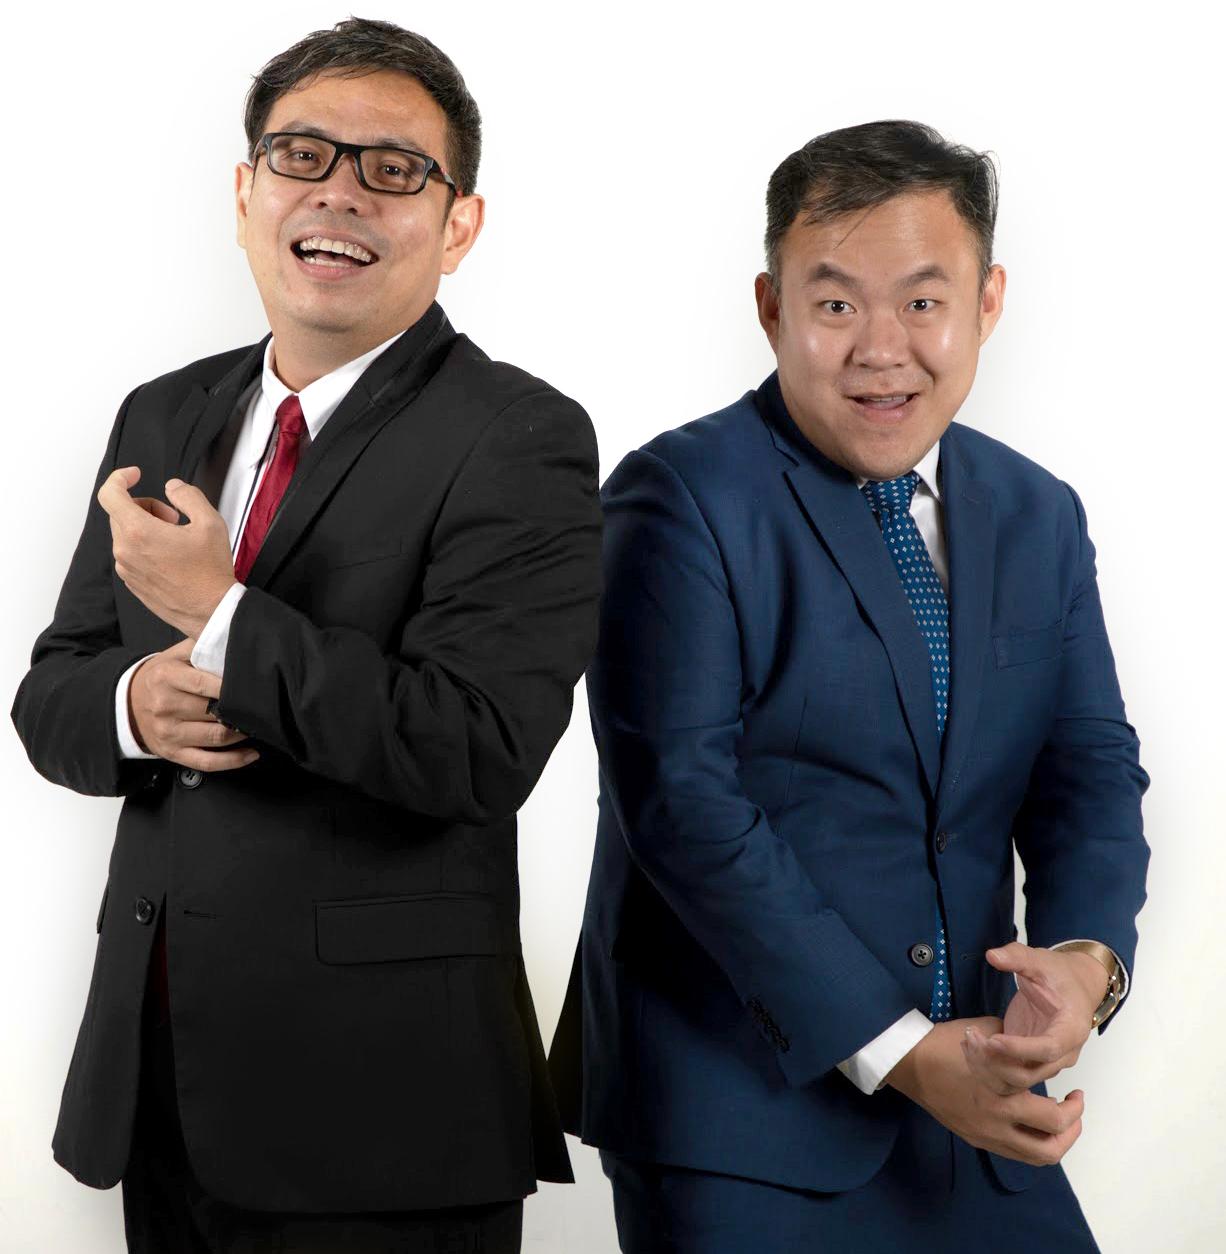 EP Marketing Malaysia's directors Alan Thoo (left) and Simon Leong (right). — Photo courtesy of EP Marketing Malaysia